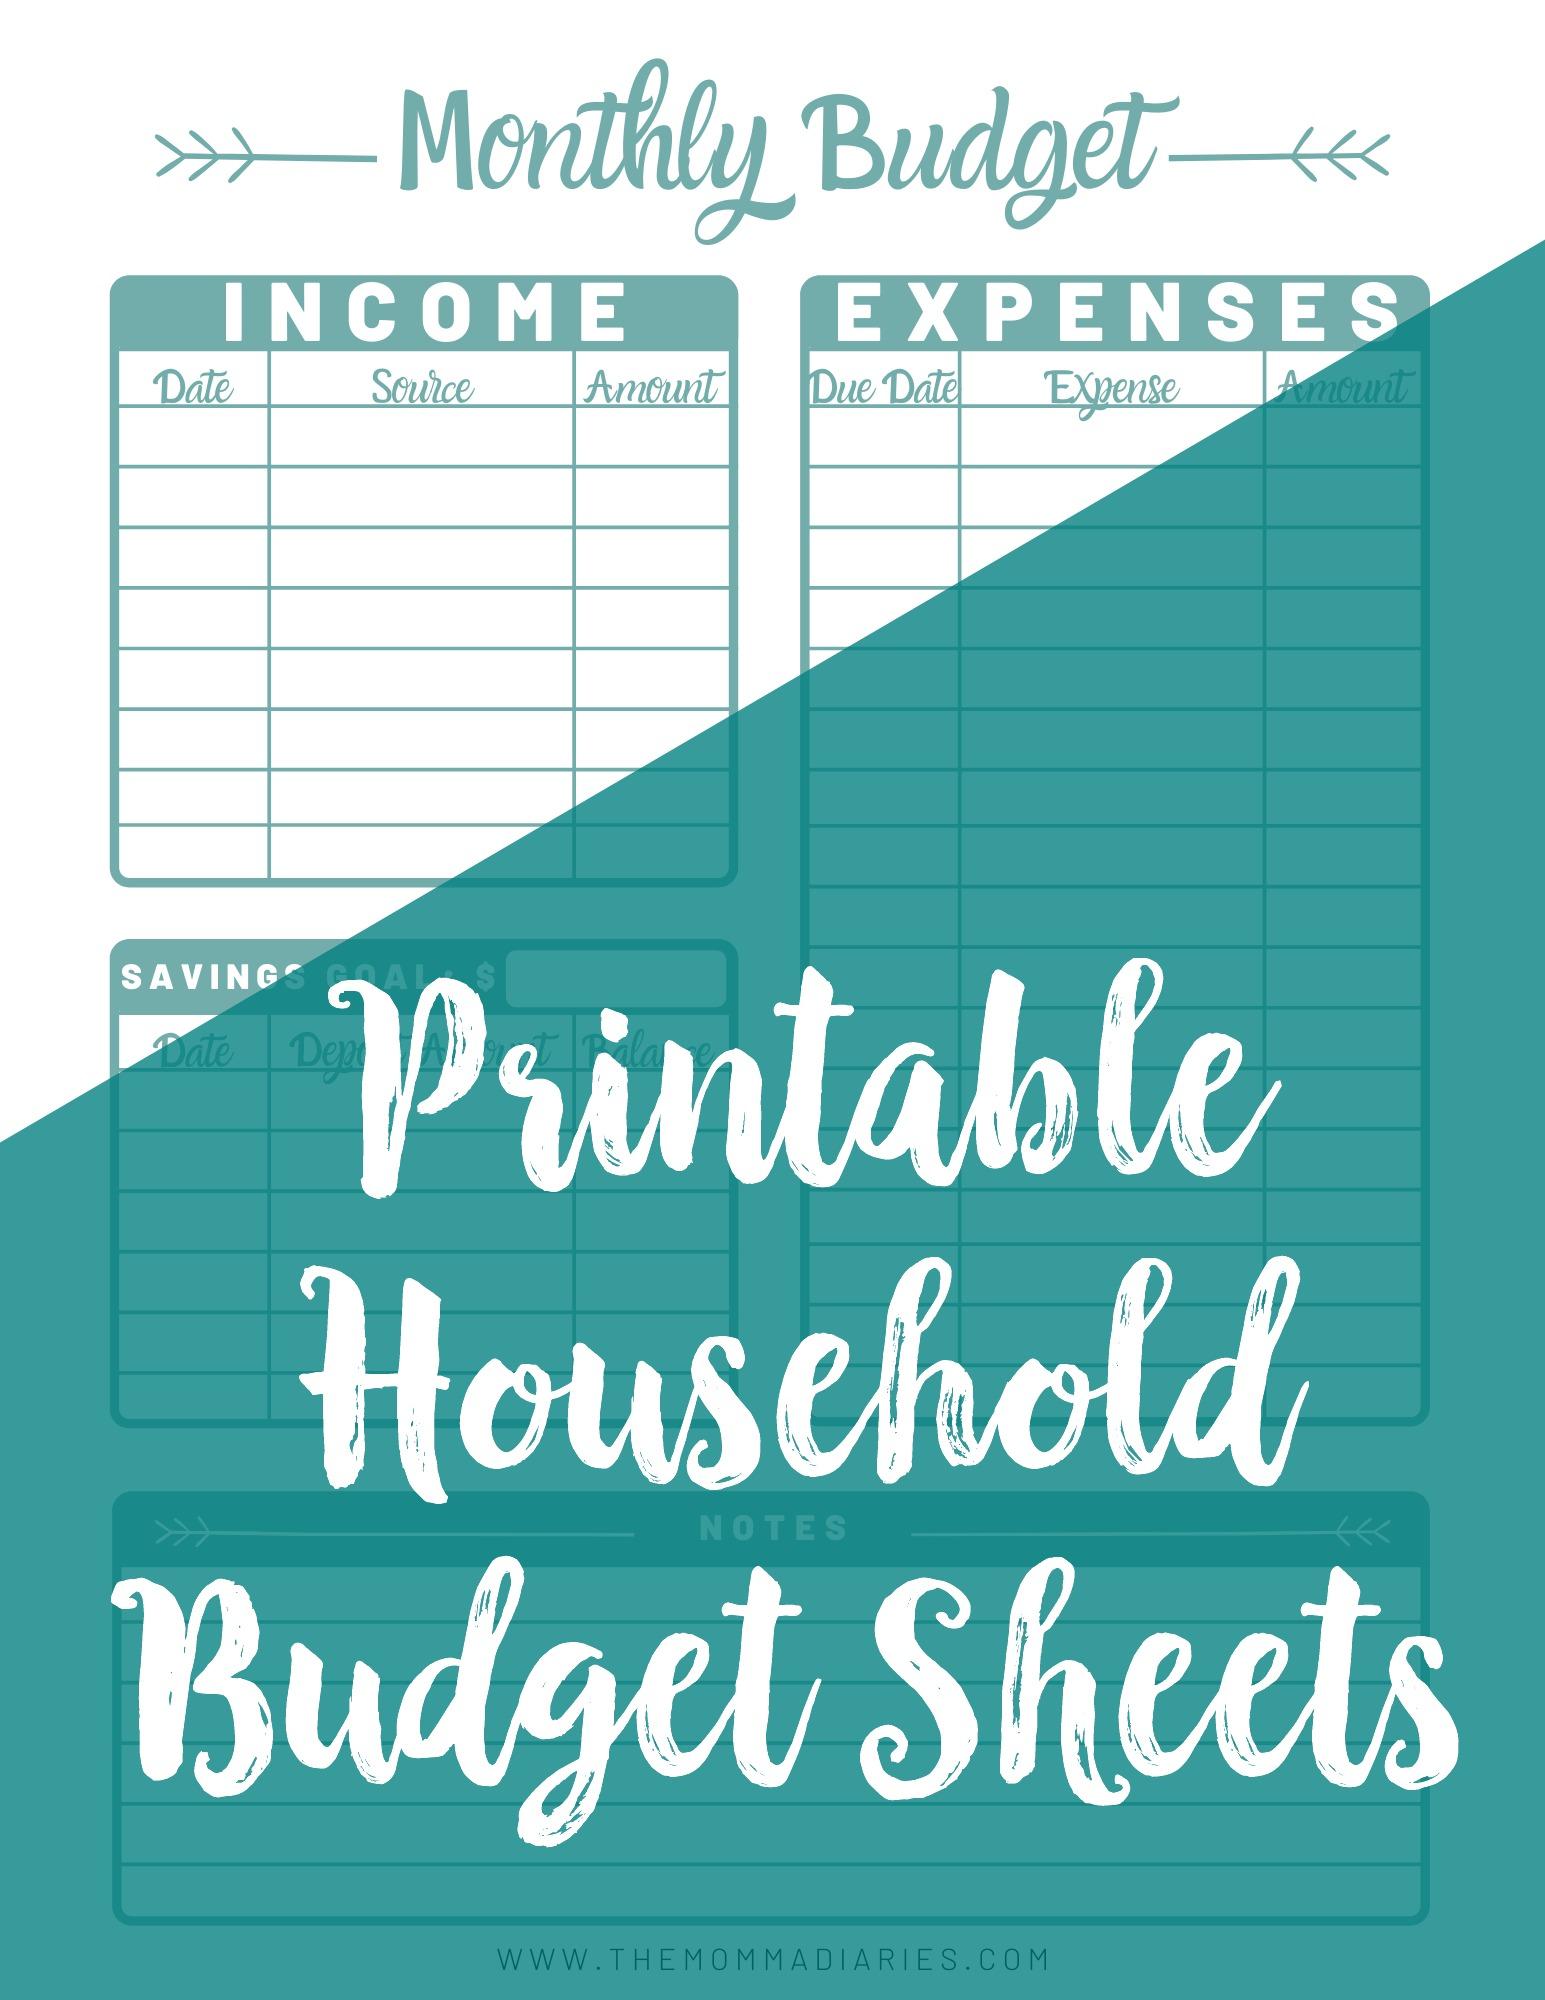 Printable household budget sheets